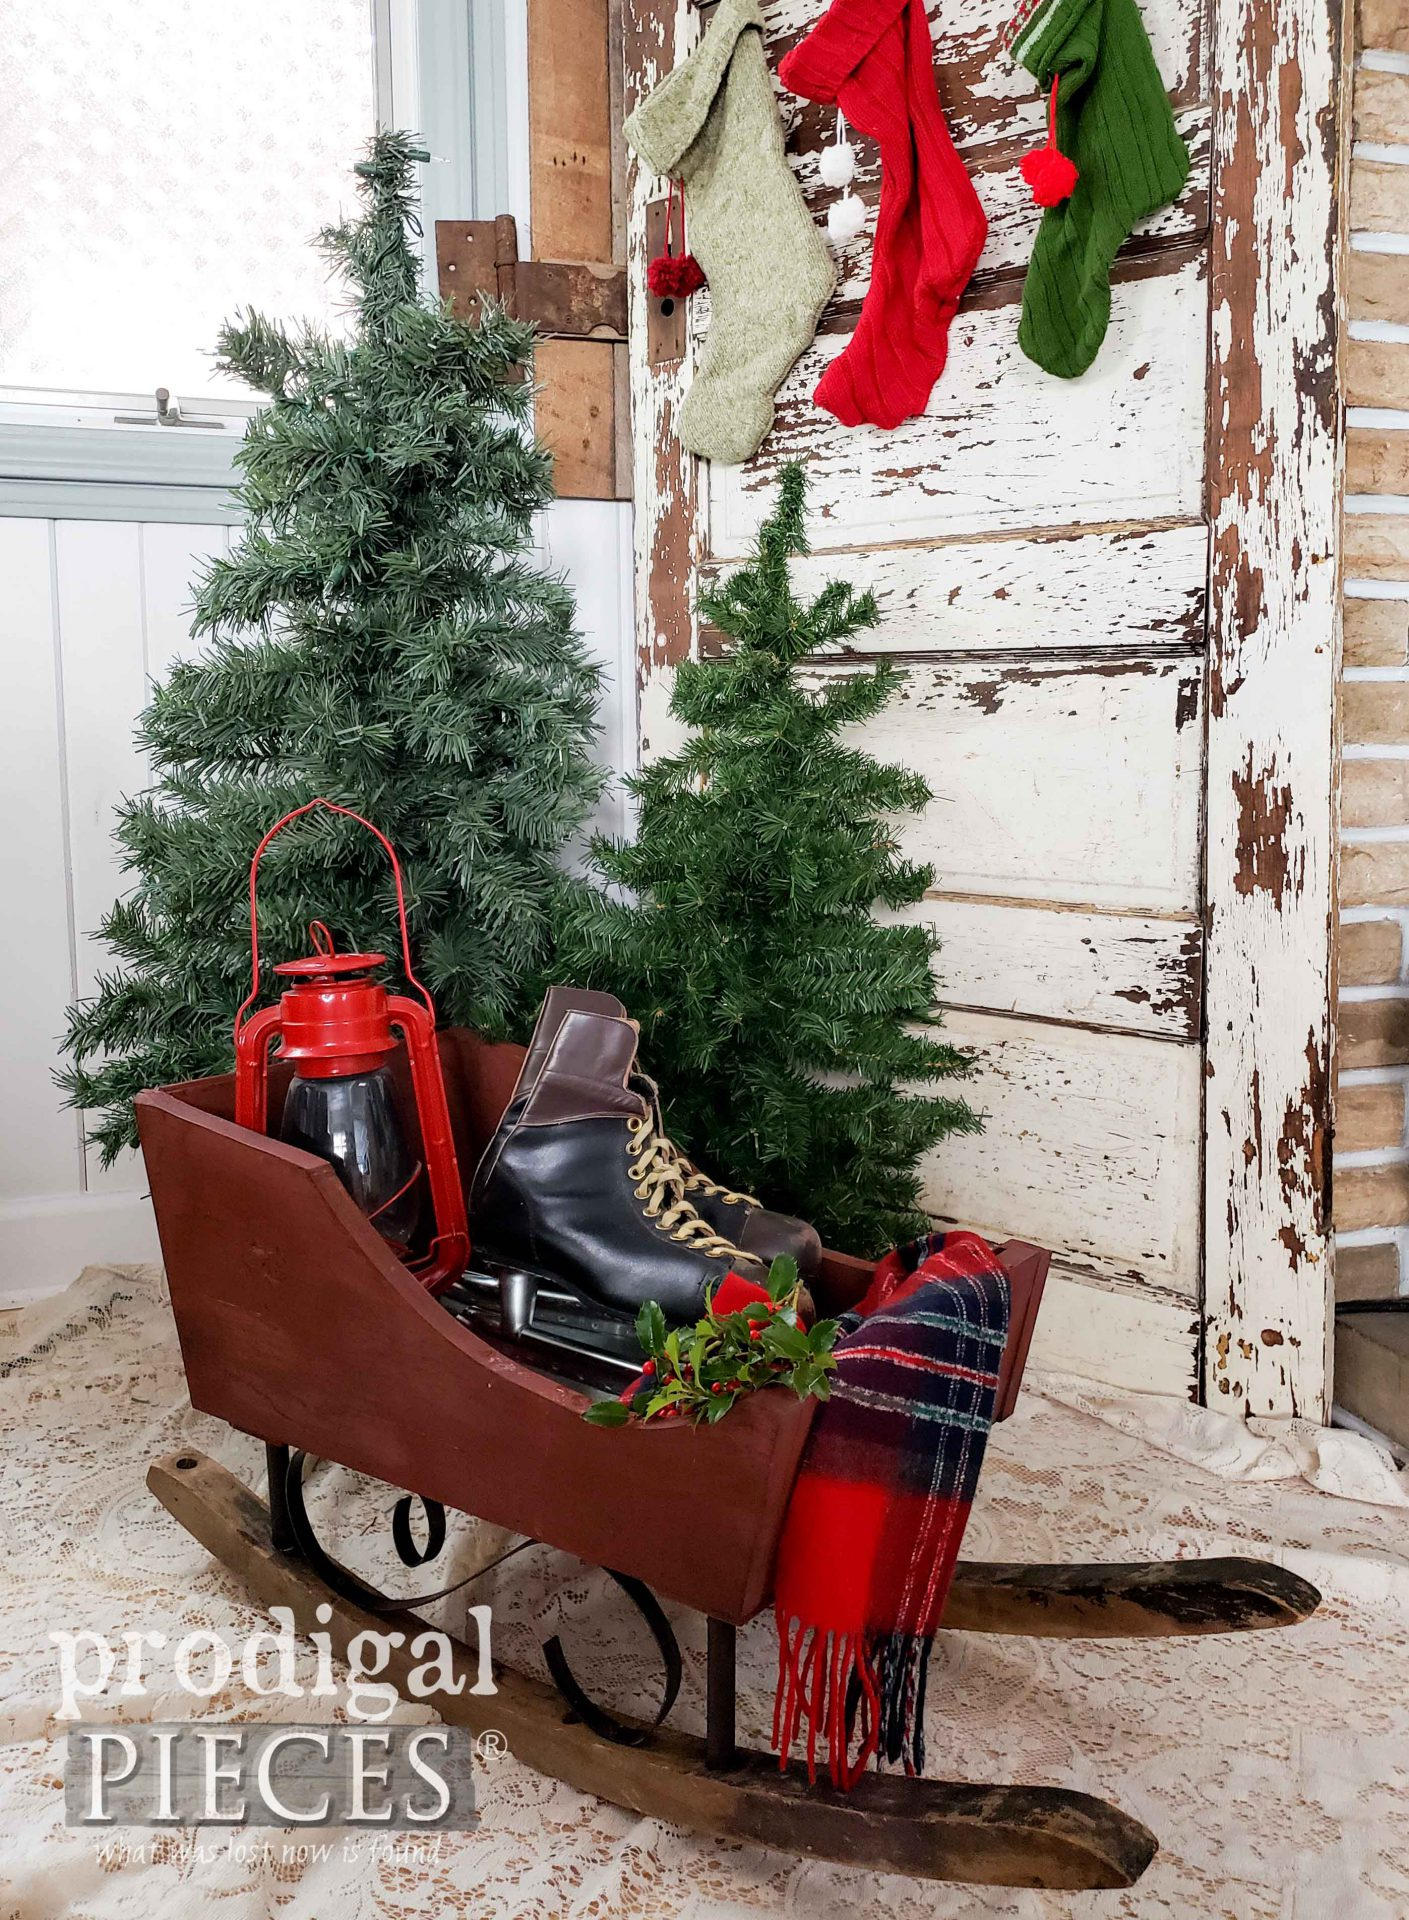 Sweet Rustic Christmas Sleigh Built by Larissa of Prodigal Pieces | prodigalpieces.com #prodigalpieces #farmhouse #diy #christmas #home #homedecor